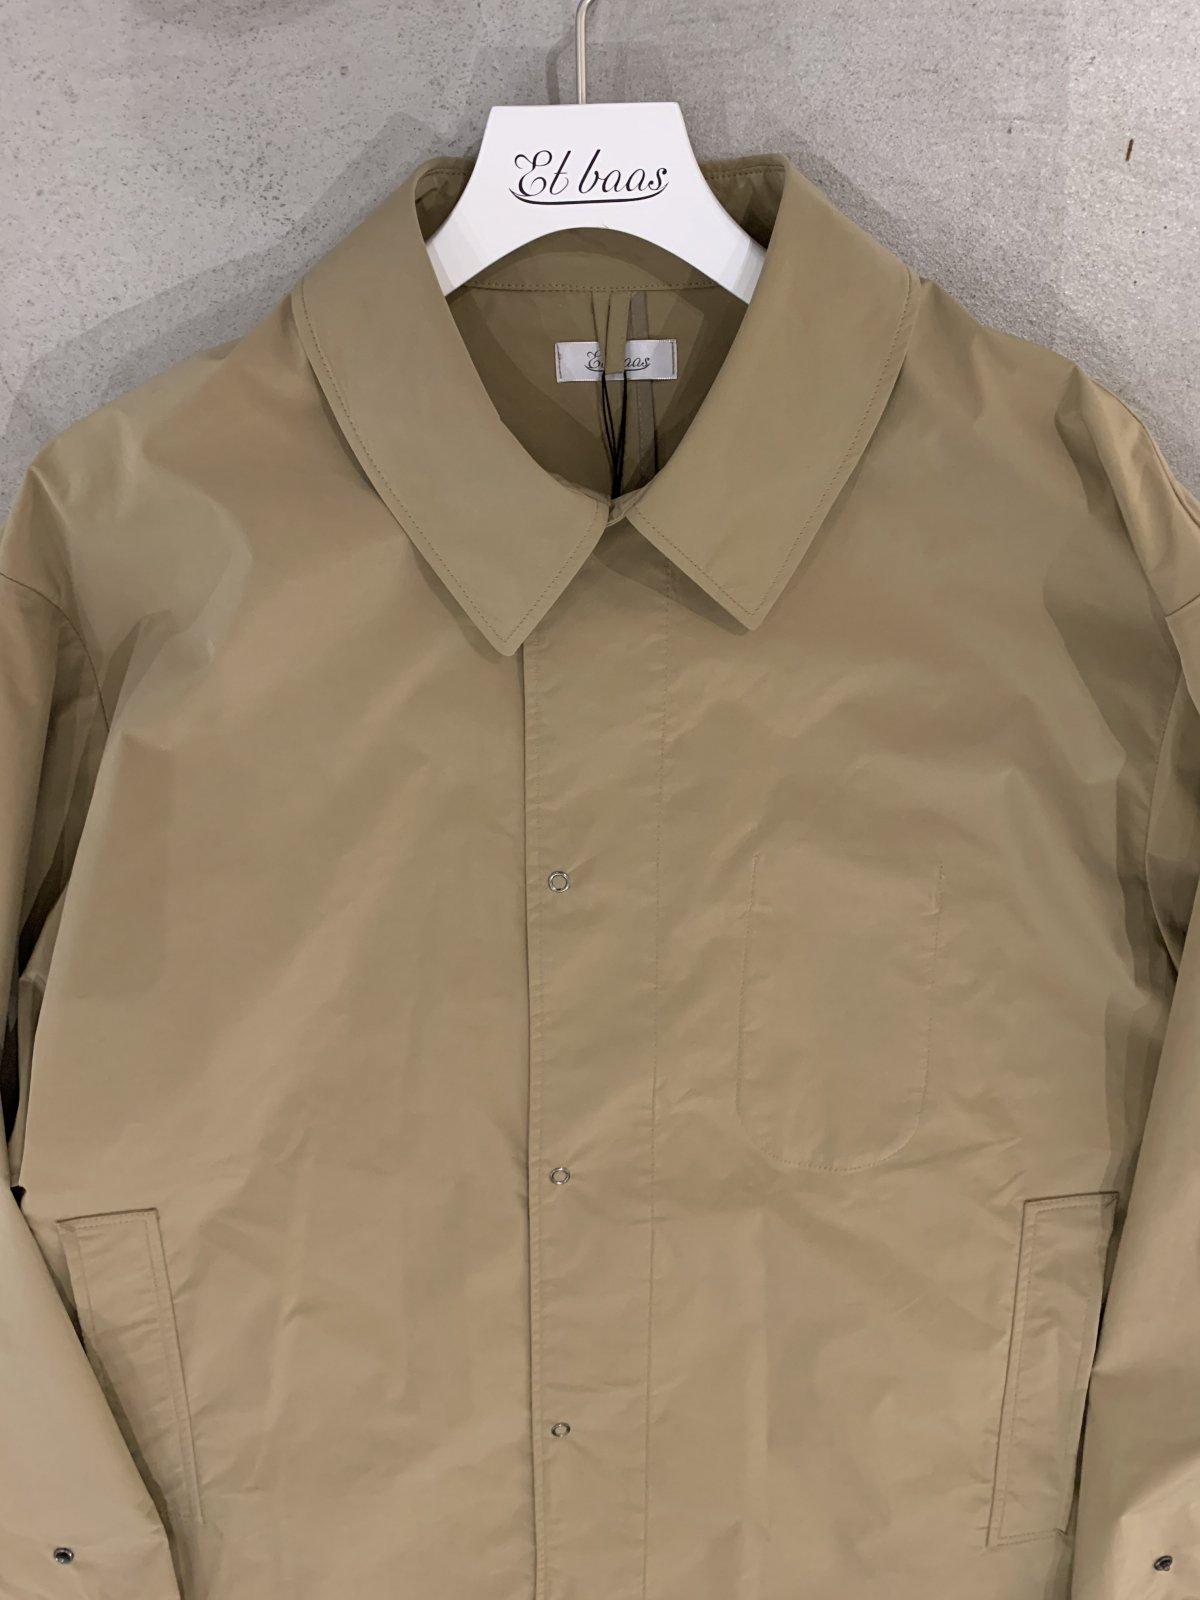 Et baas Comfy Coat 詳細画像12